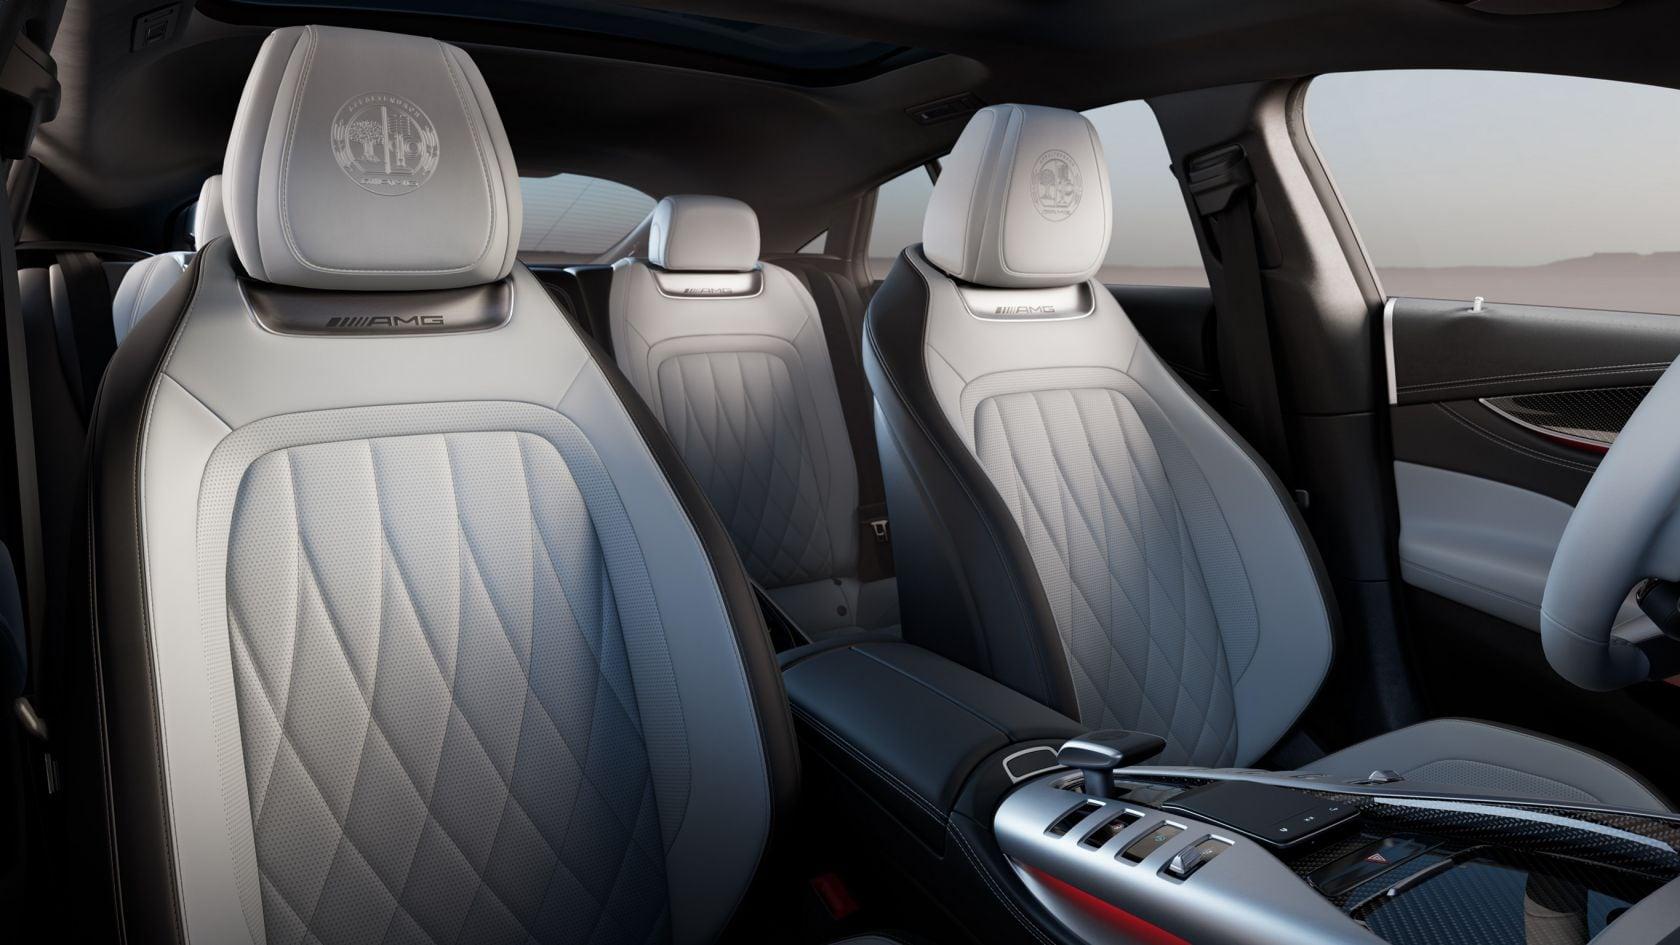 Mercedes-AMG-GT-4-door-coupe-Car-Avenue-05